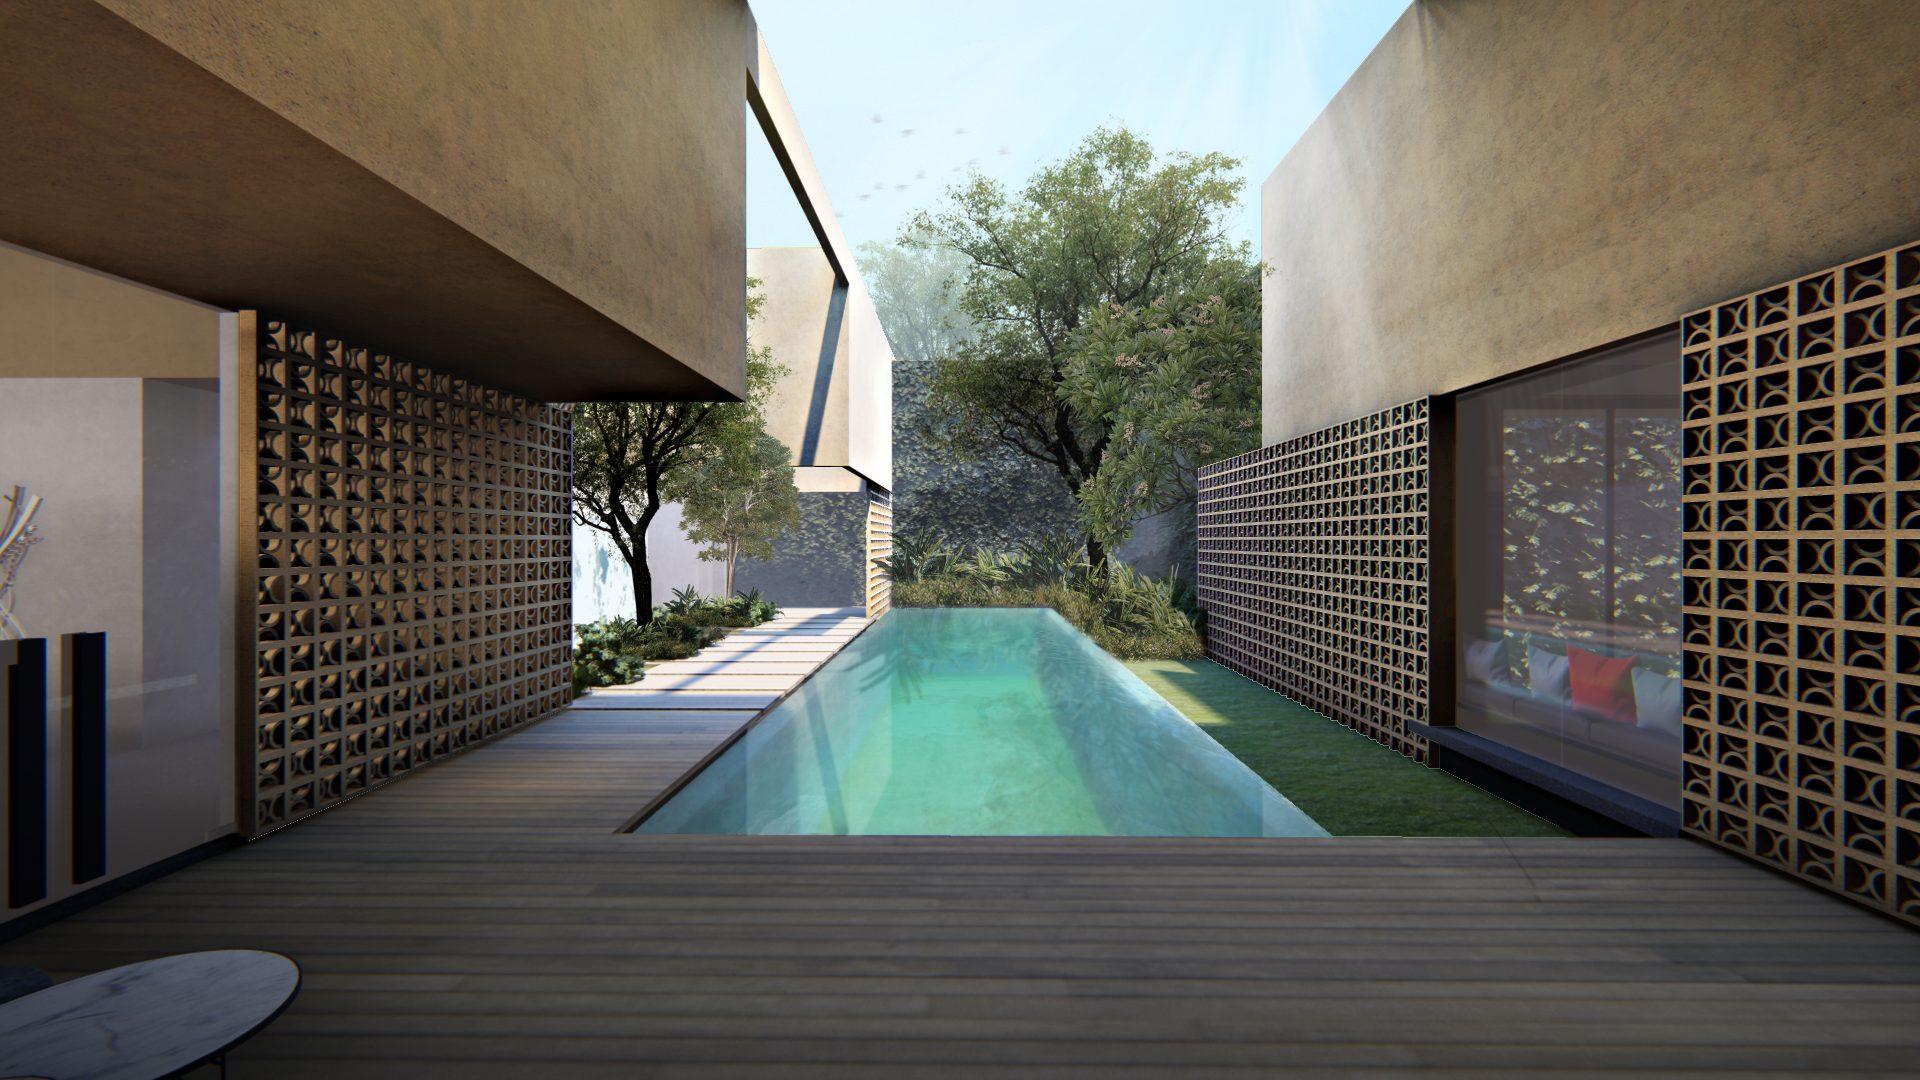 Ben House 2 - Image 5